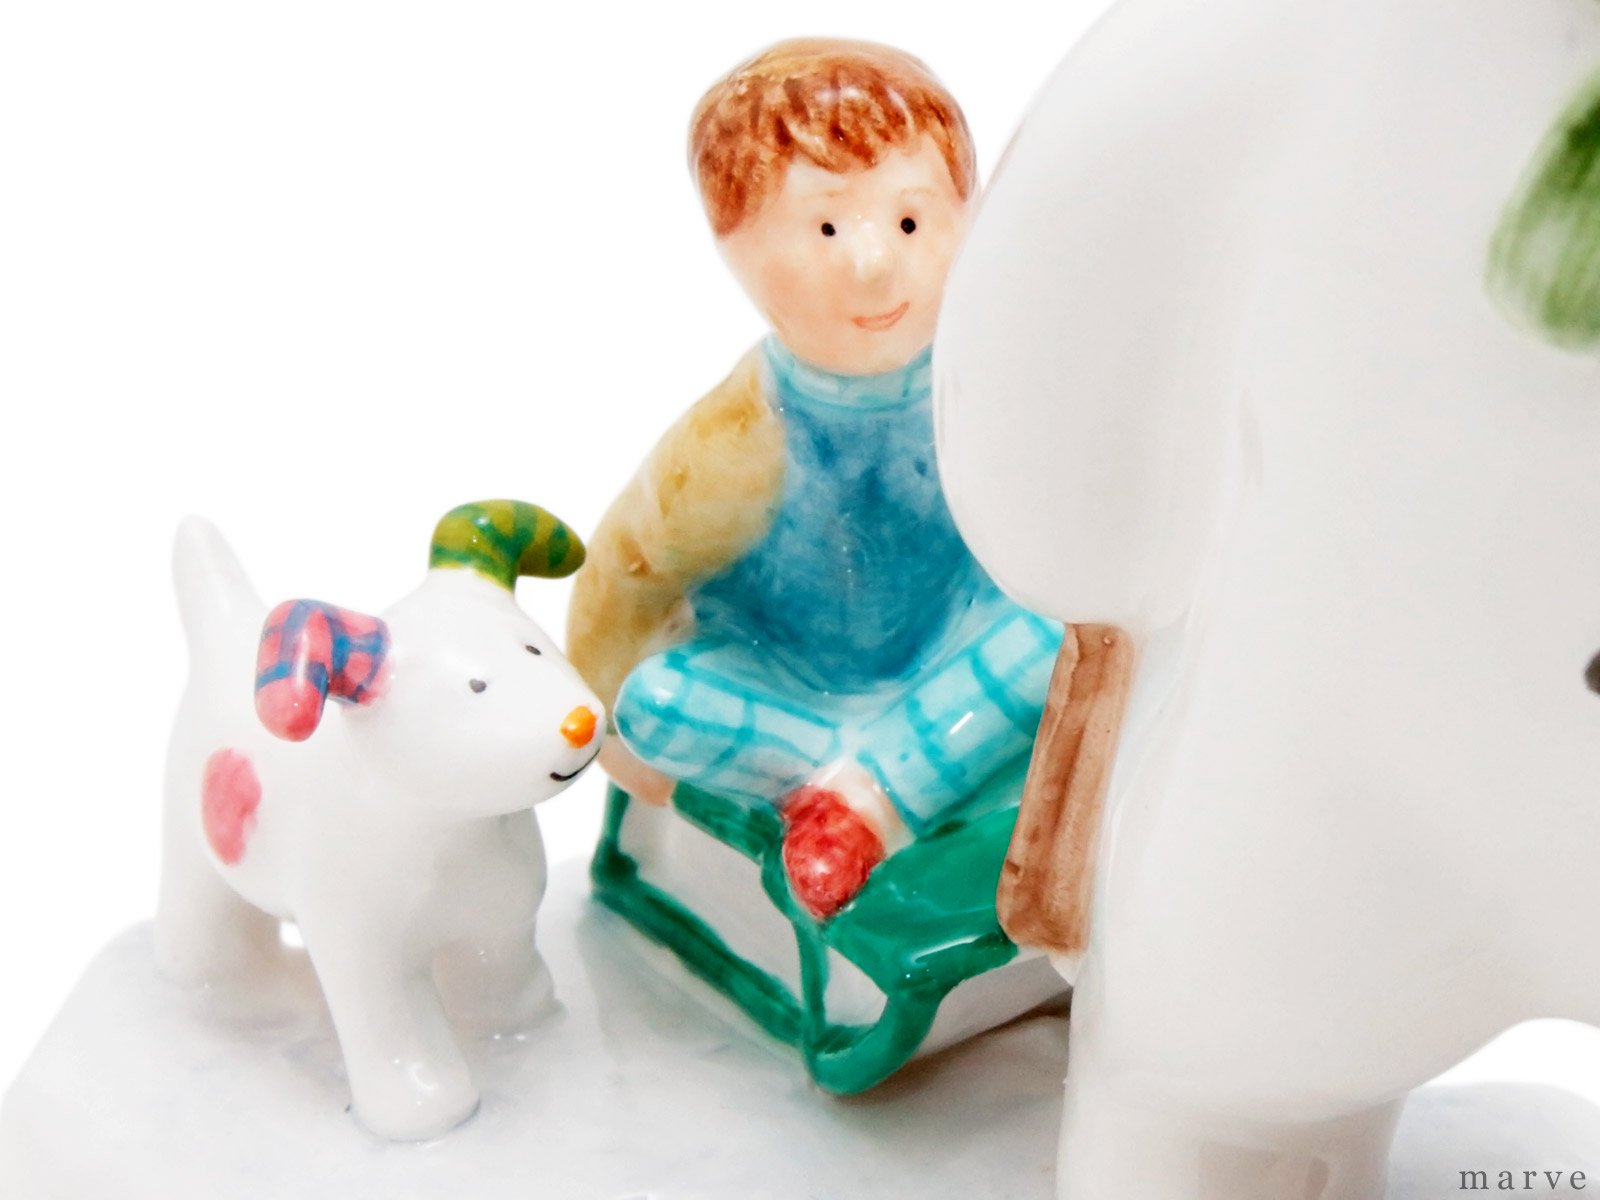 【OUTLET】The Snowman フィギュリン スノーマンとビリーとスノードッグ